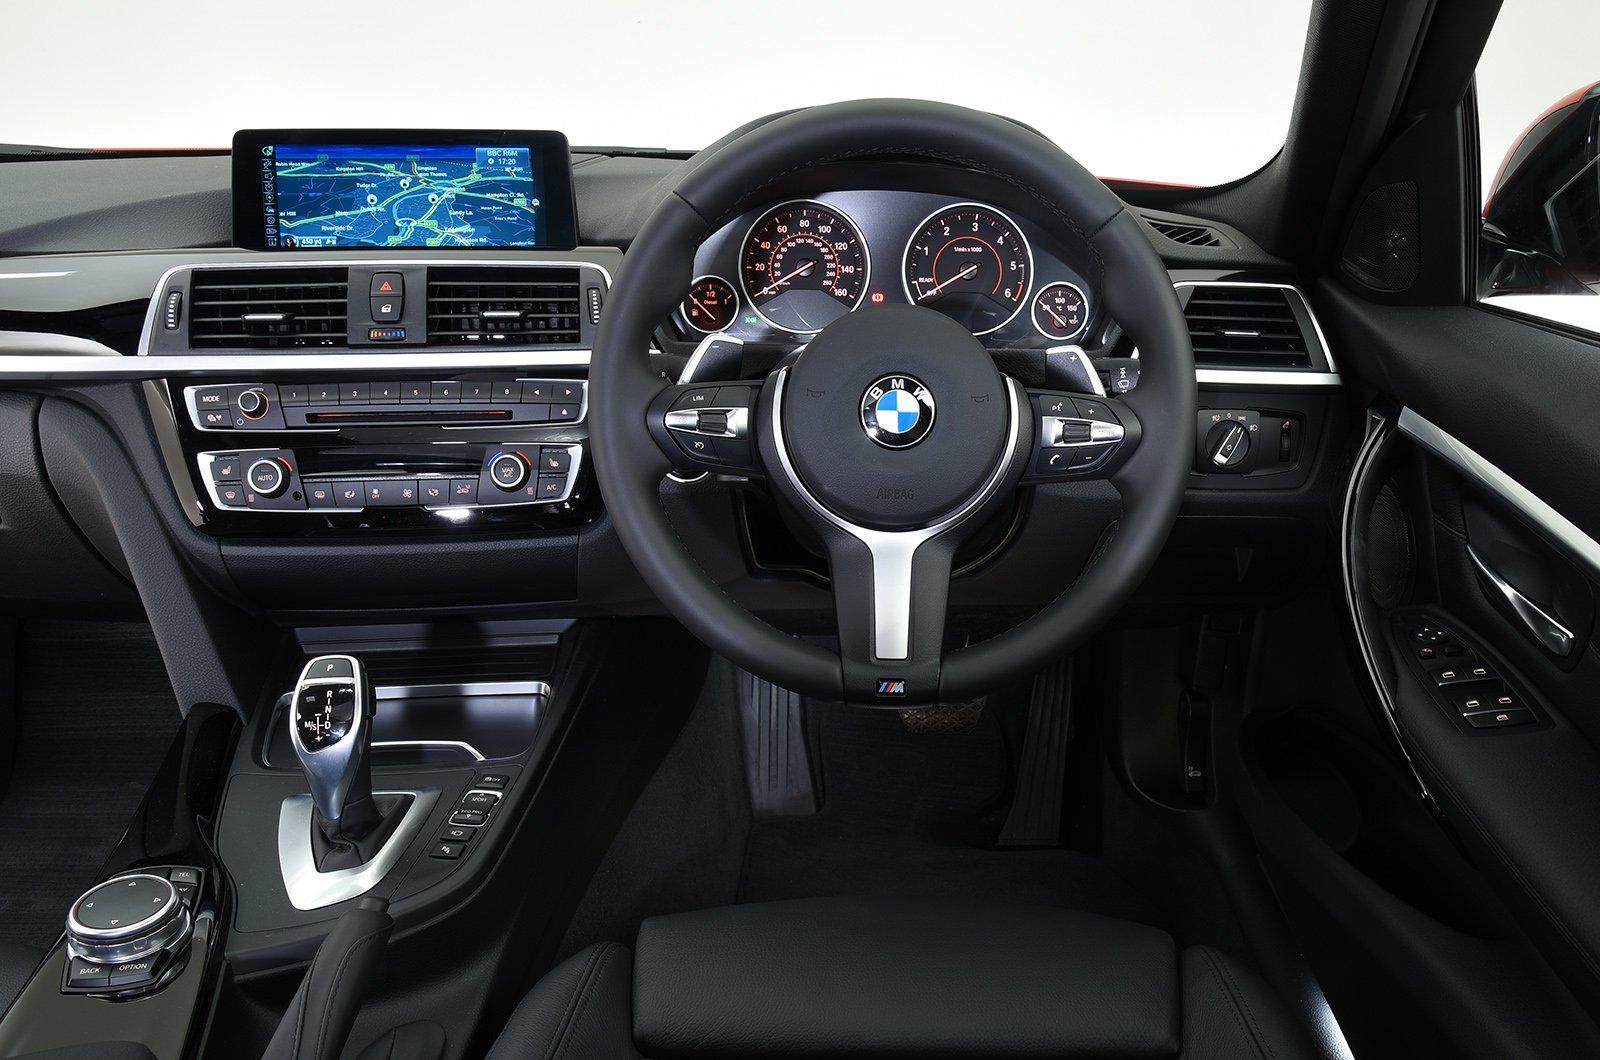 BMW 3 Series 12-19 interior